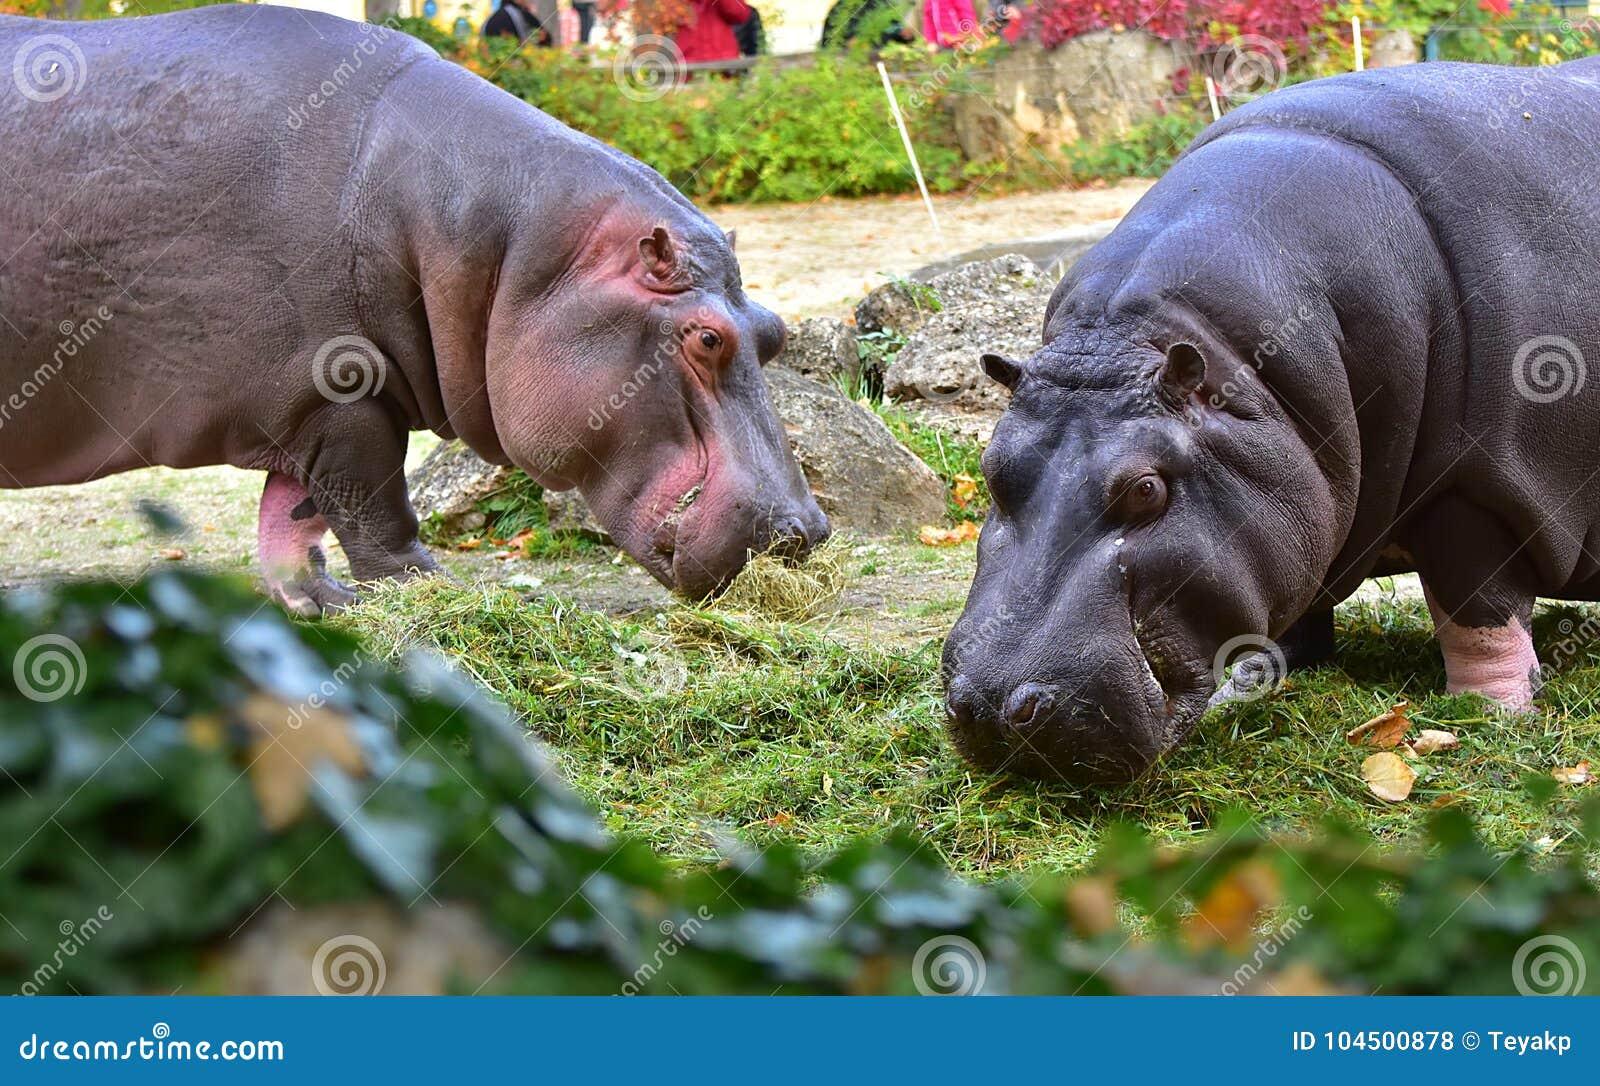 Two Hippopotamus eating green grass